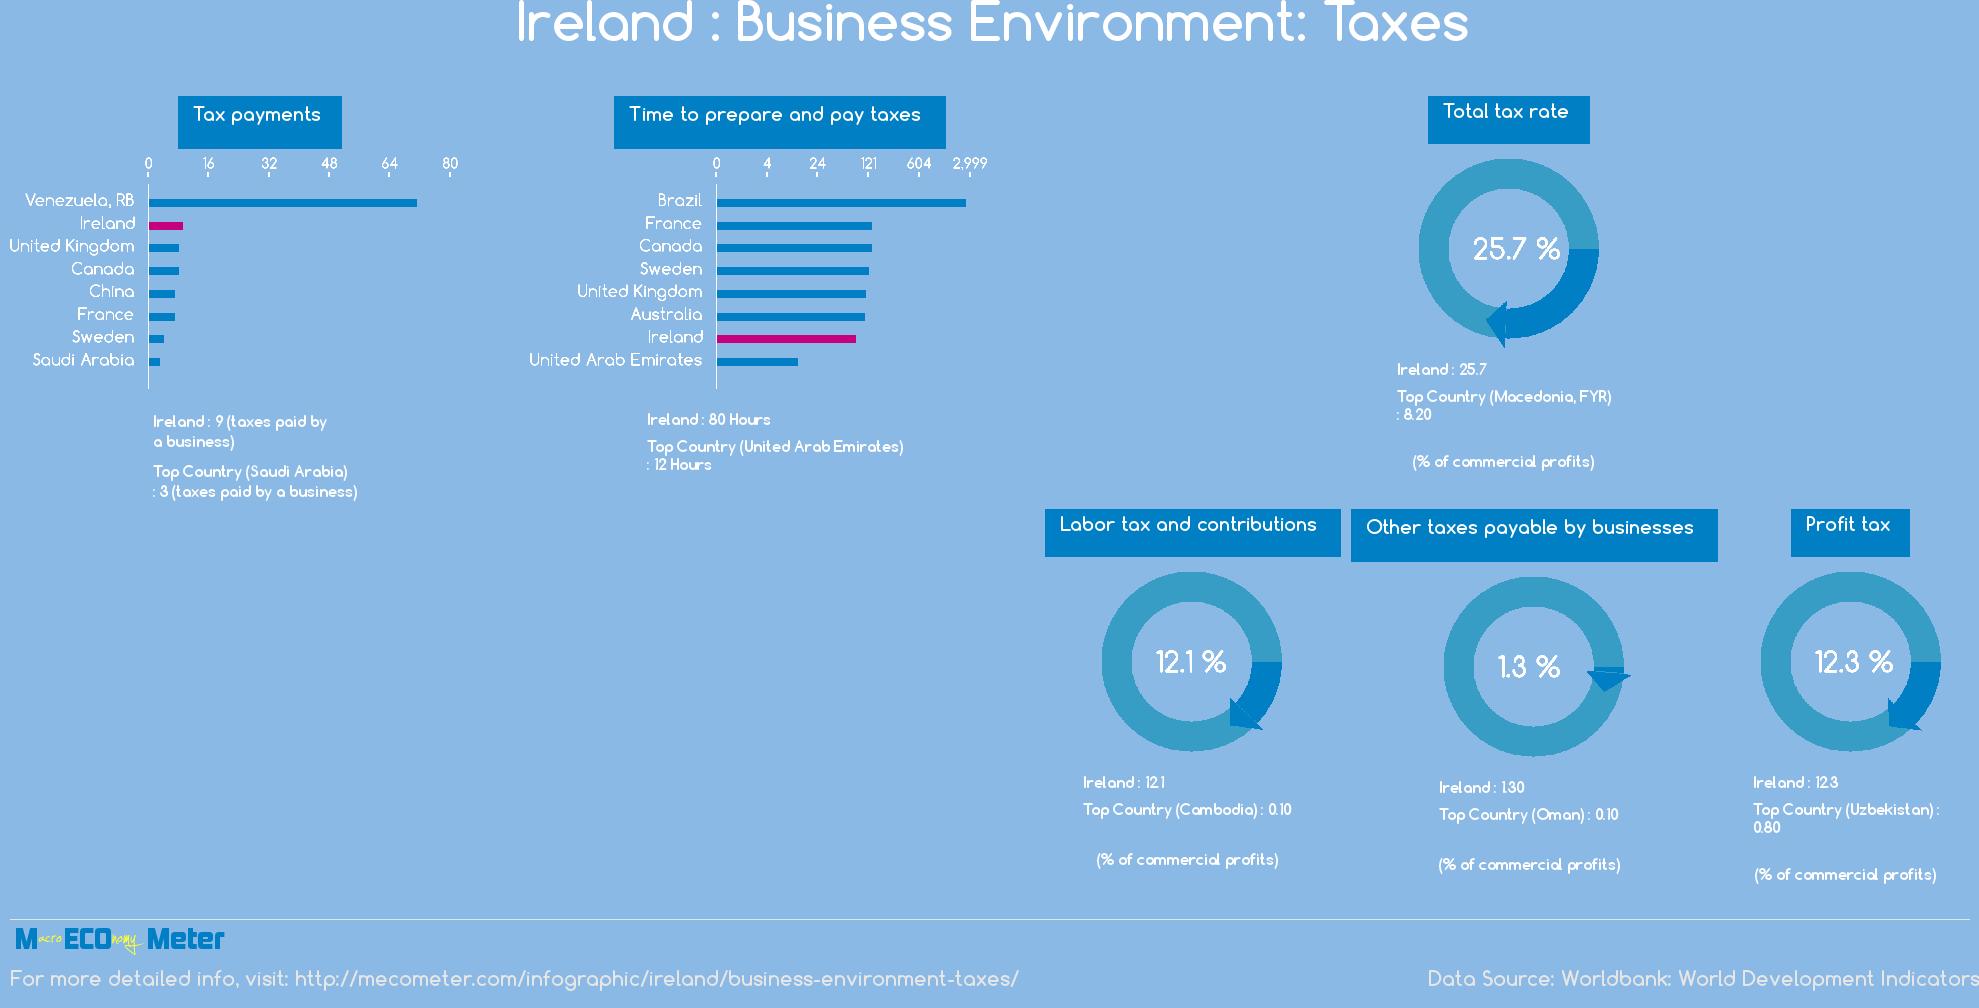 Ireland : Business Environment: Taxes